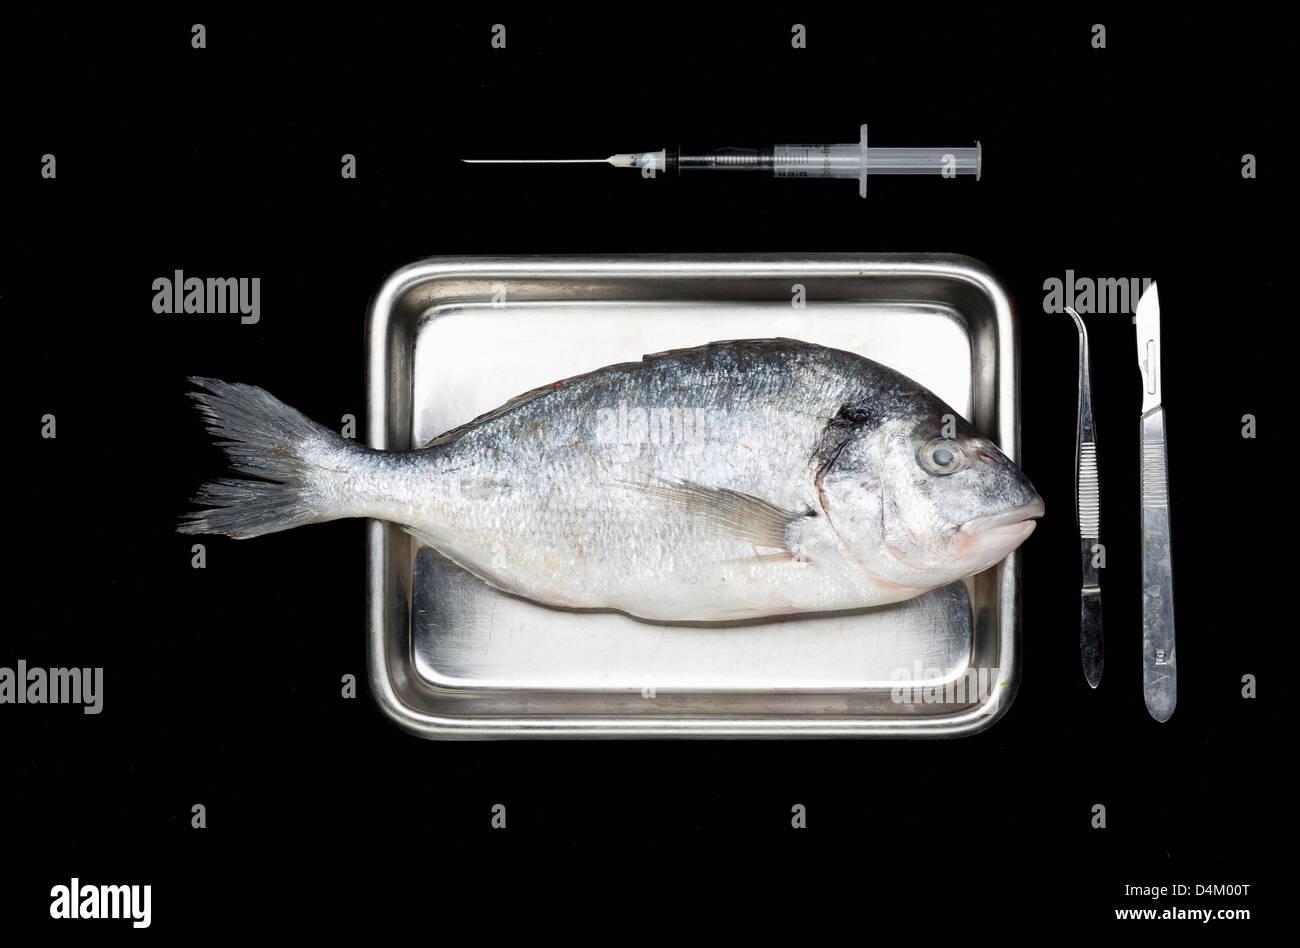 Fresh fish on surgery tray - Stock Image